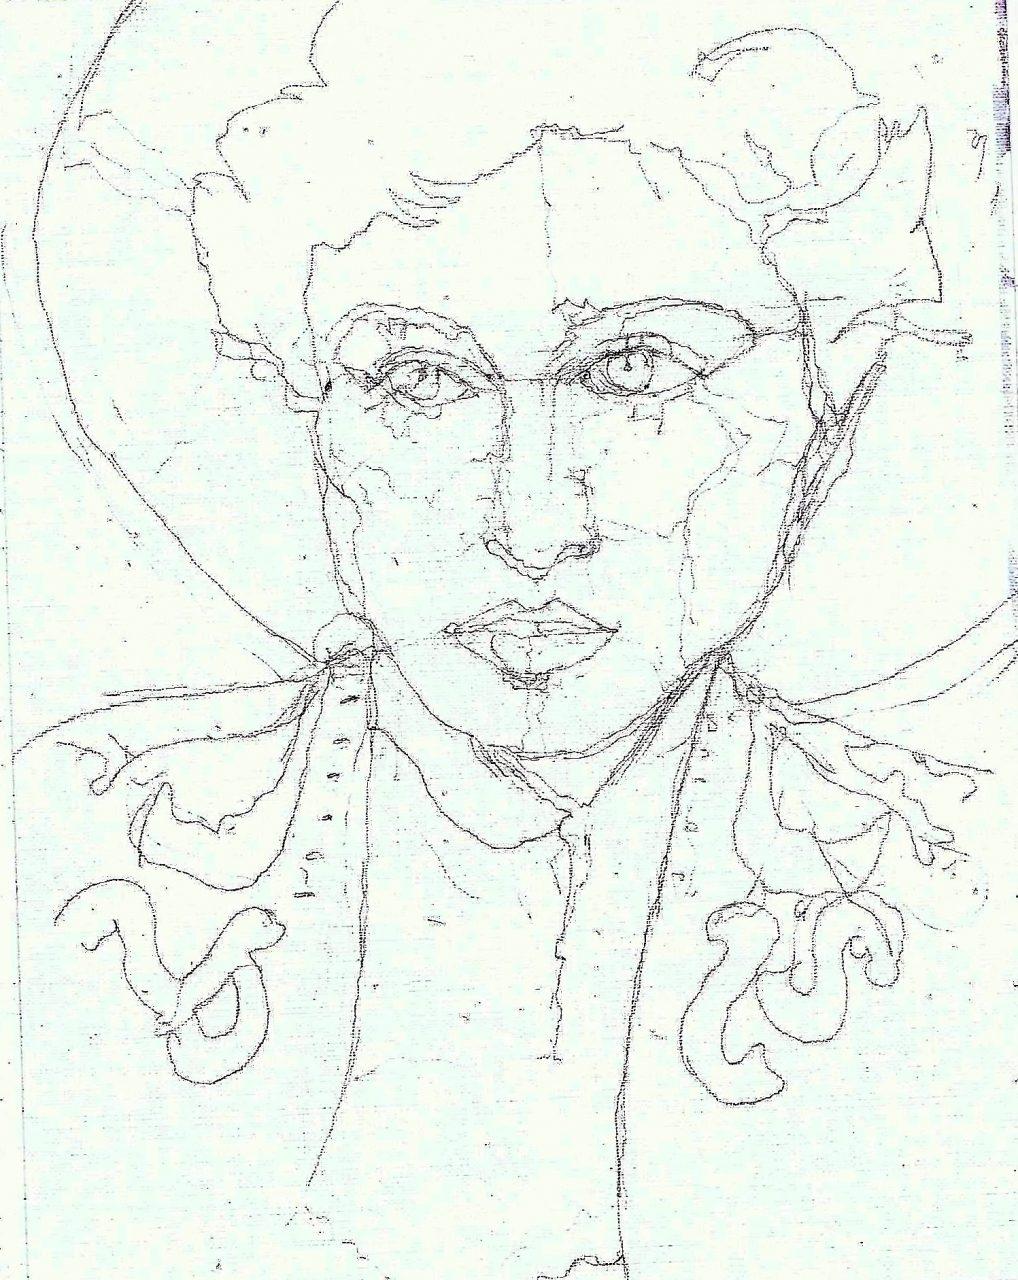 365 dagen een portret 160 Madonna, zangeres Potlood 19c25